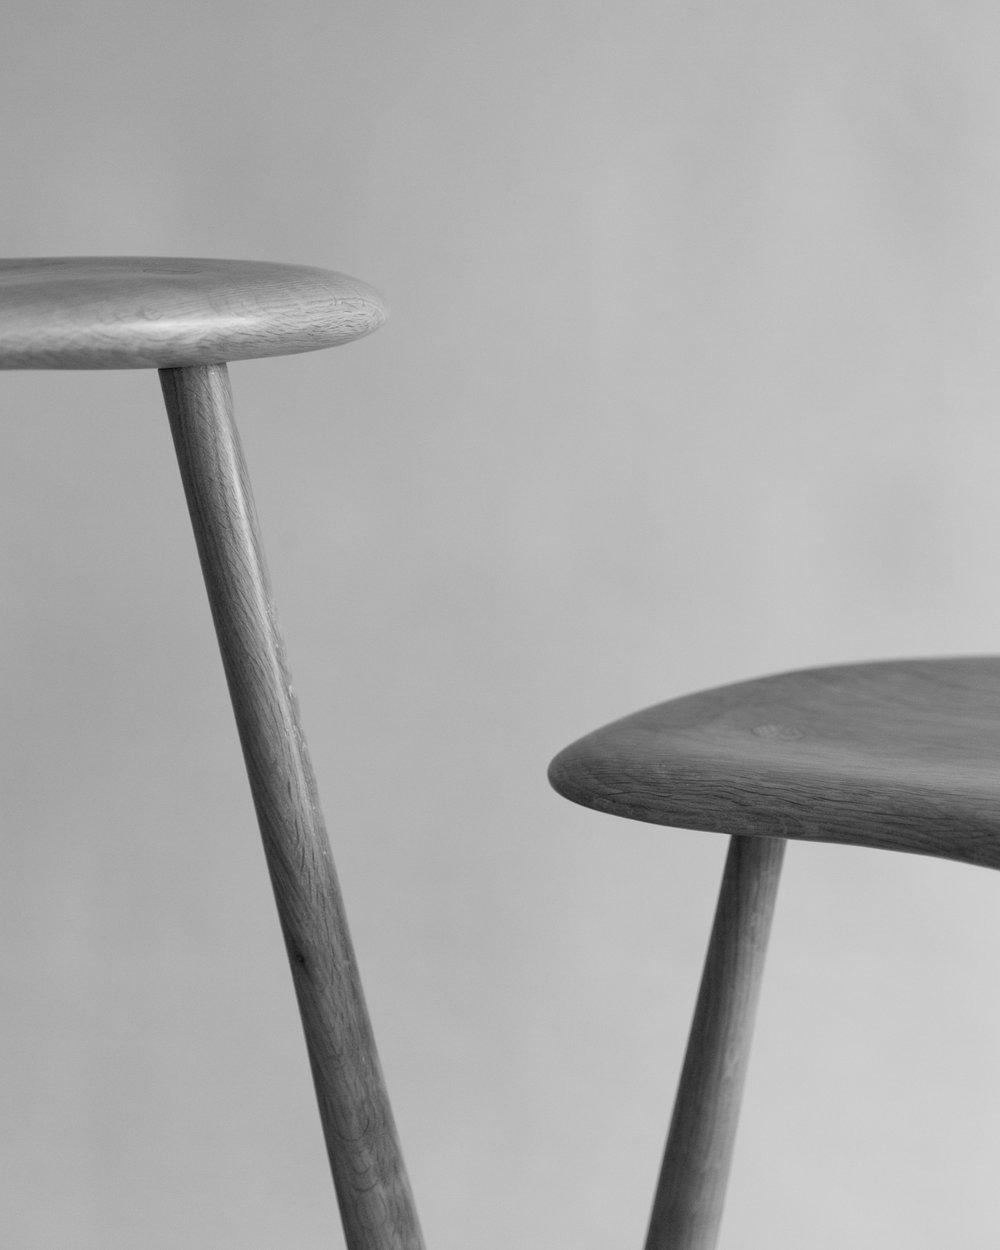 stools-card-14.jpg